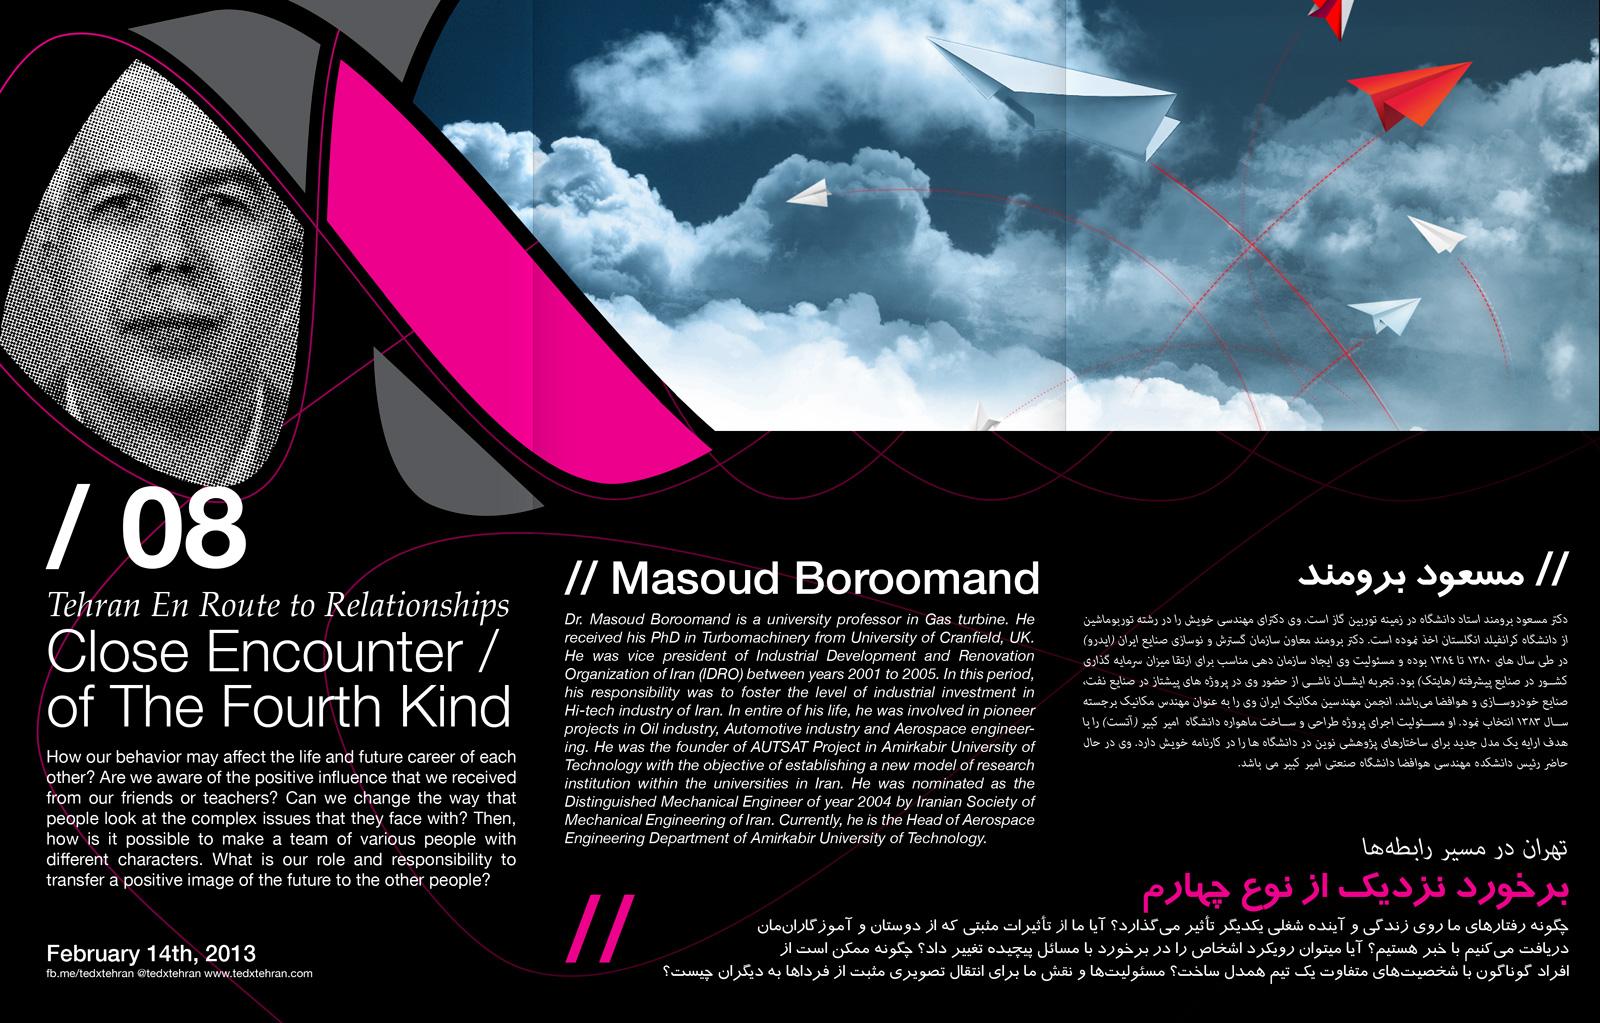 Masoud Boroomand